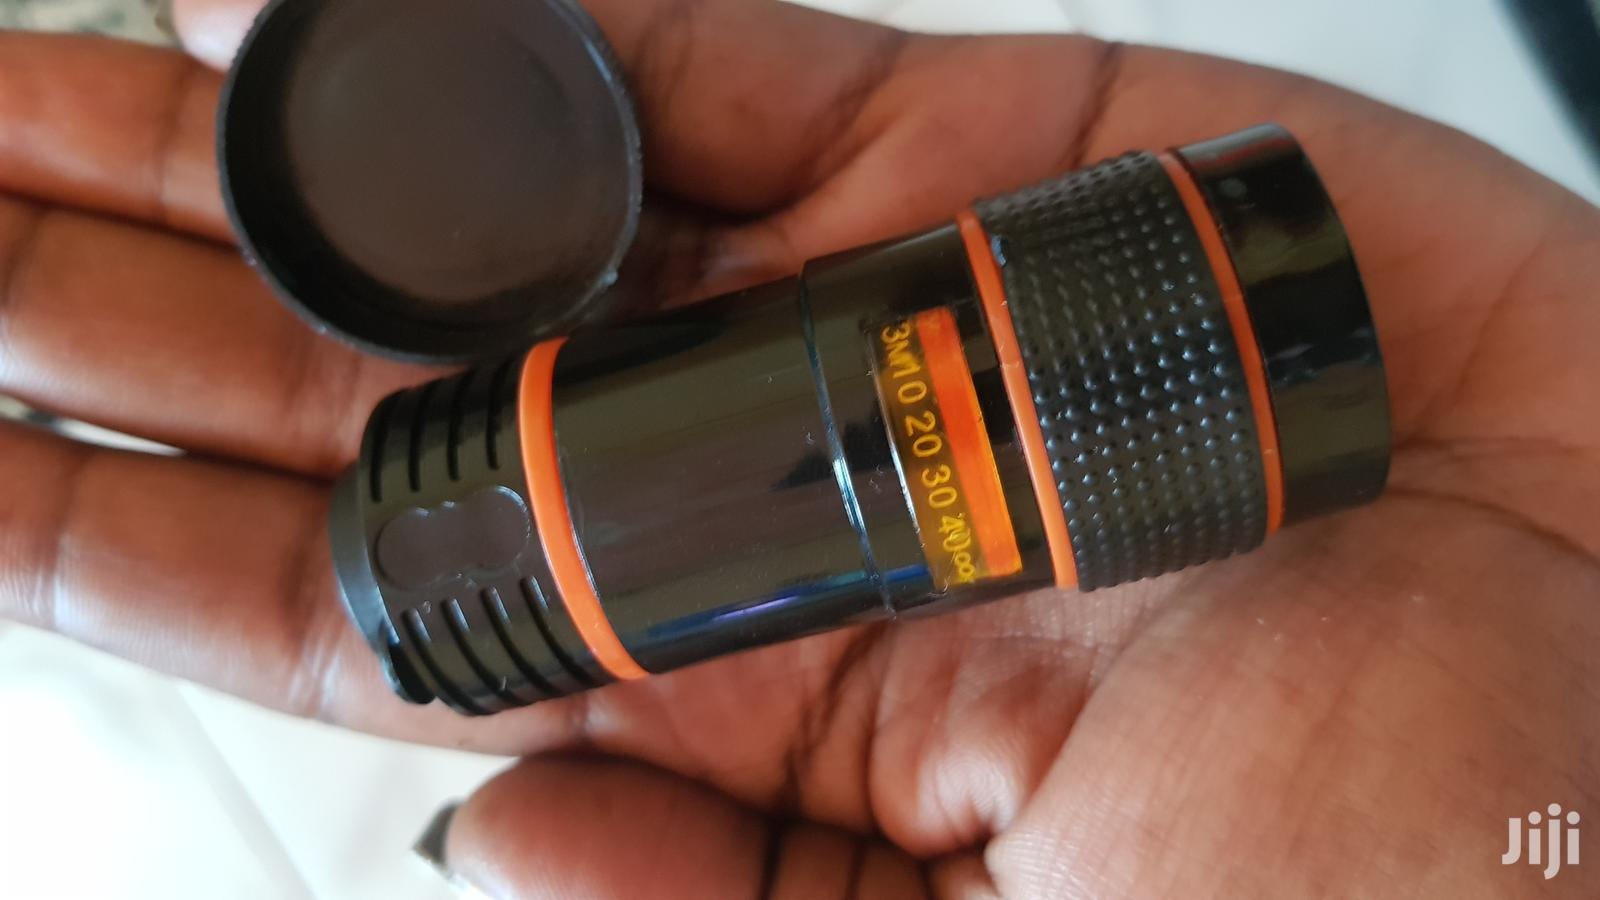 Mobile Telescope Lenses   Accessories for Mobile Phones & Tablets for sale in London, Nakuru, Kenya